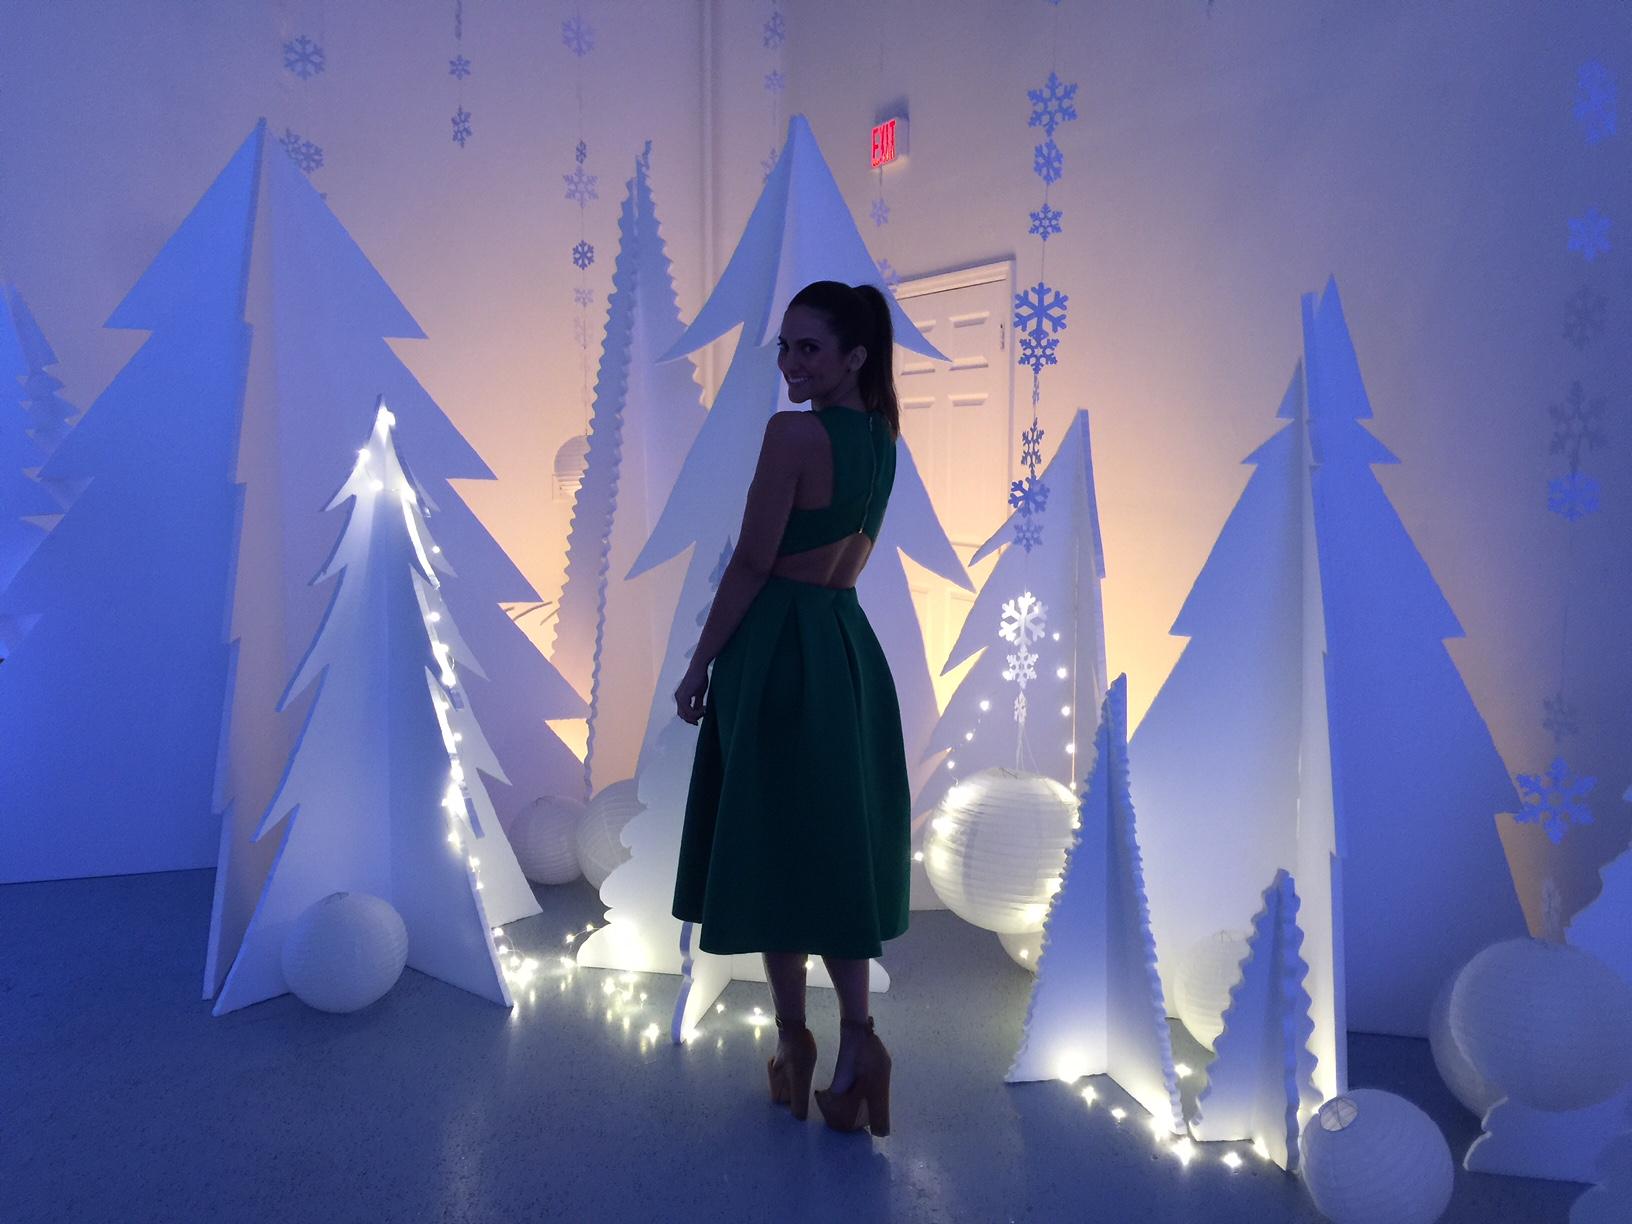 Styrofoam Pine Tree Props